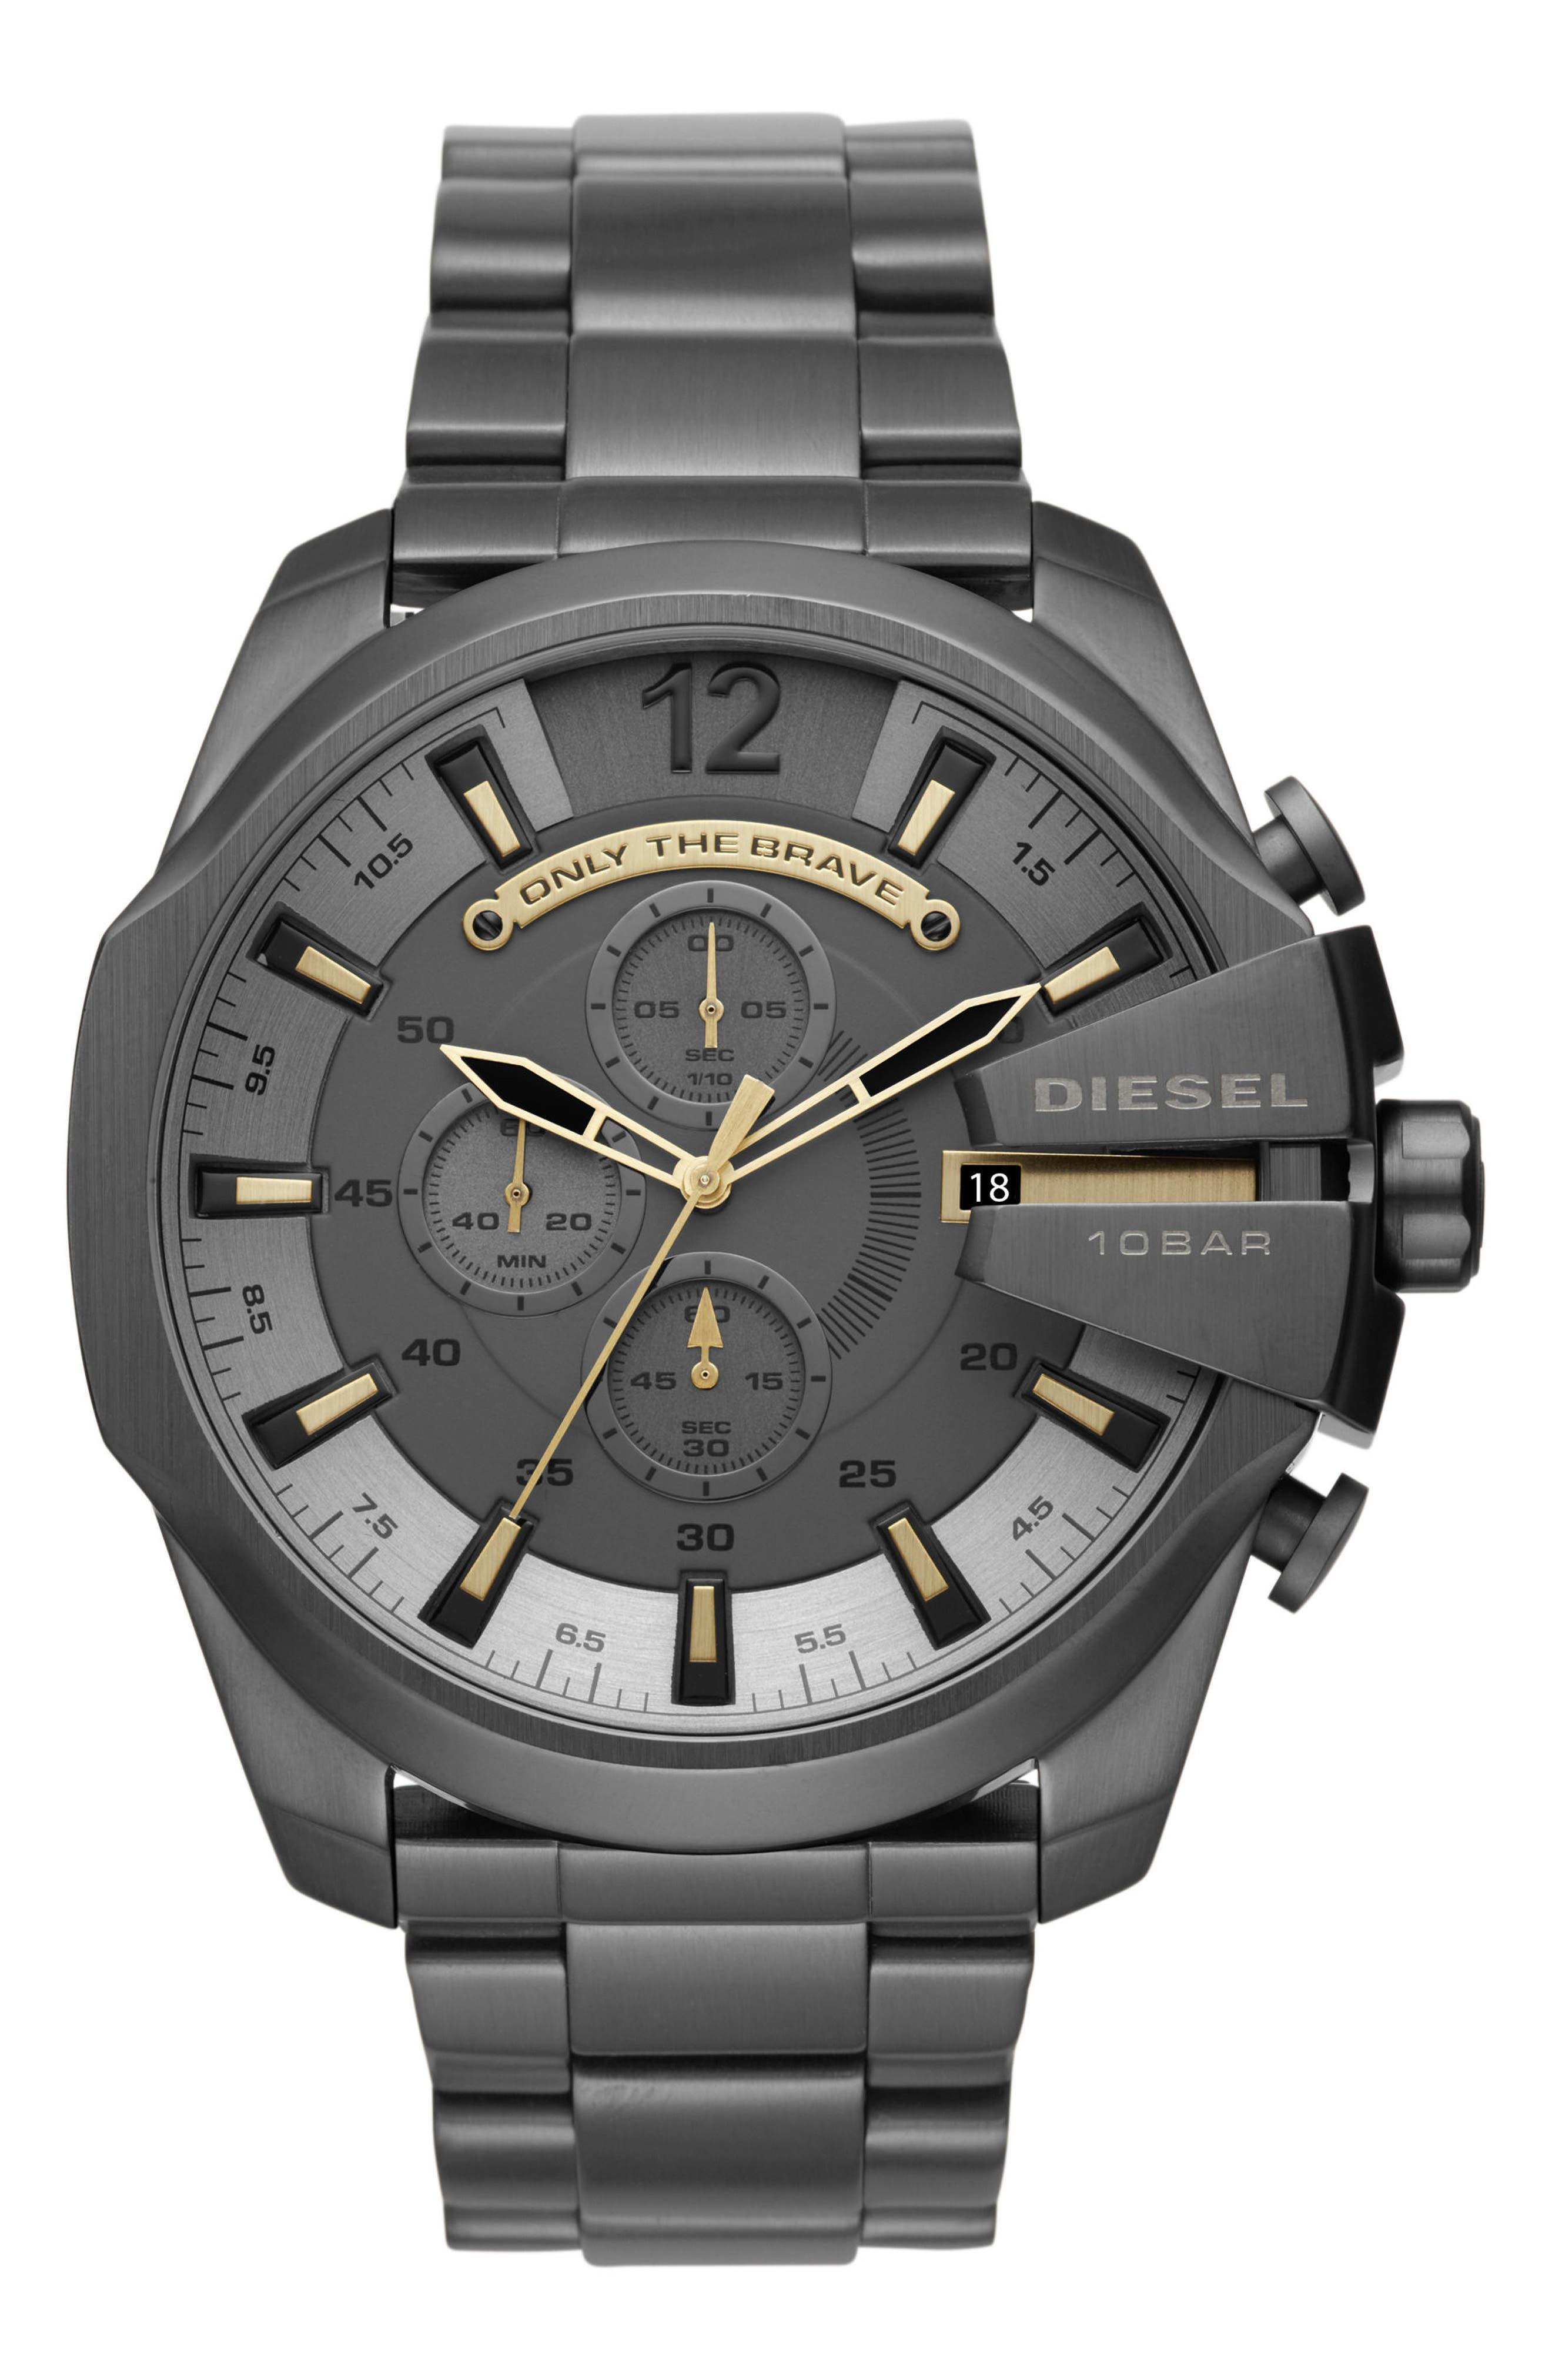 Main Image - DIESEL Mega Chief Chronograph Bracelet Watch, 51mm x 59mm